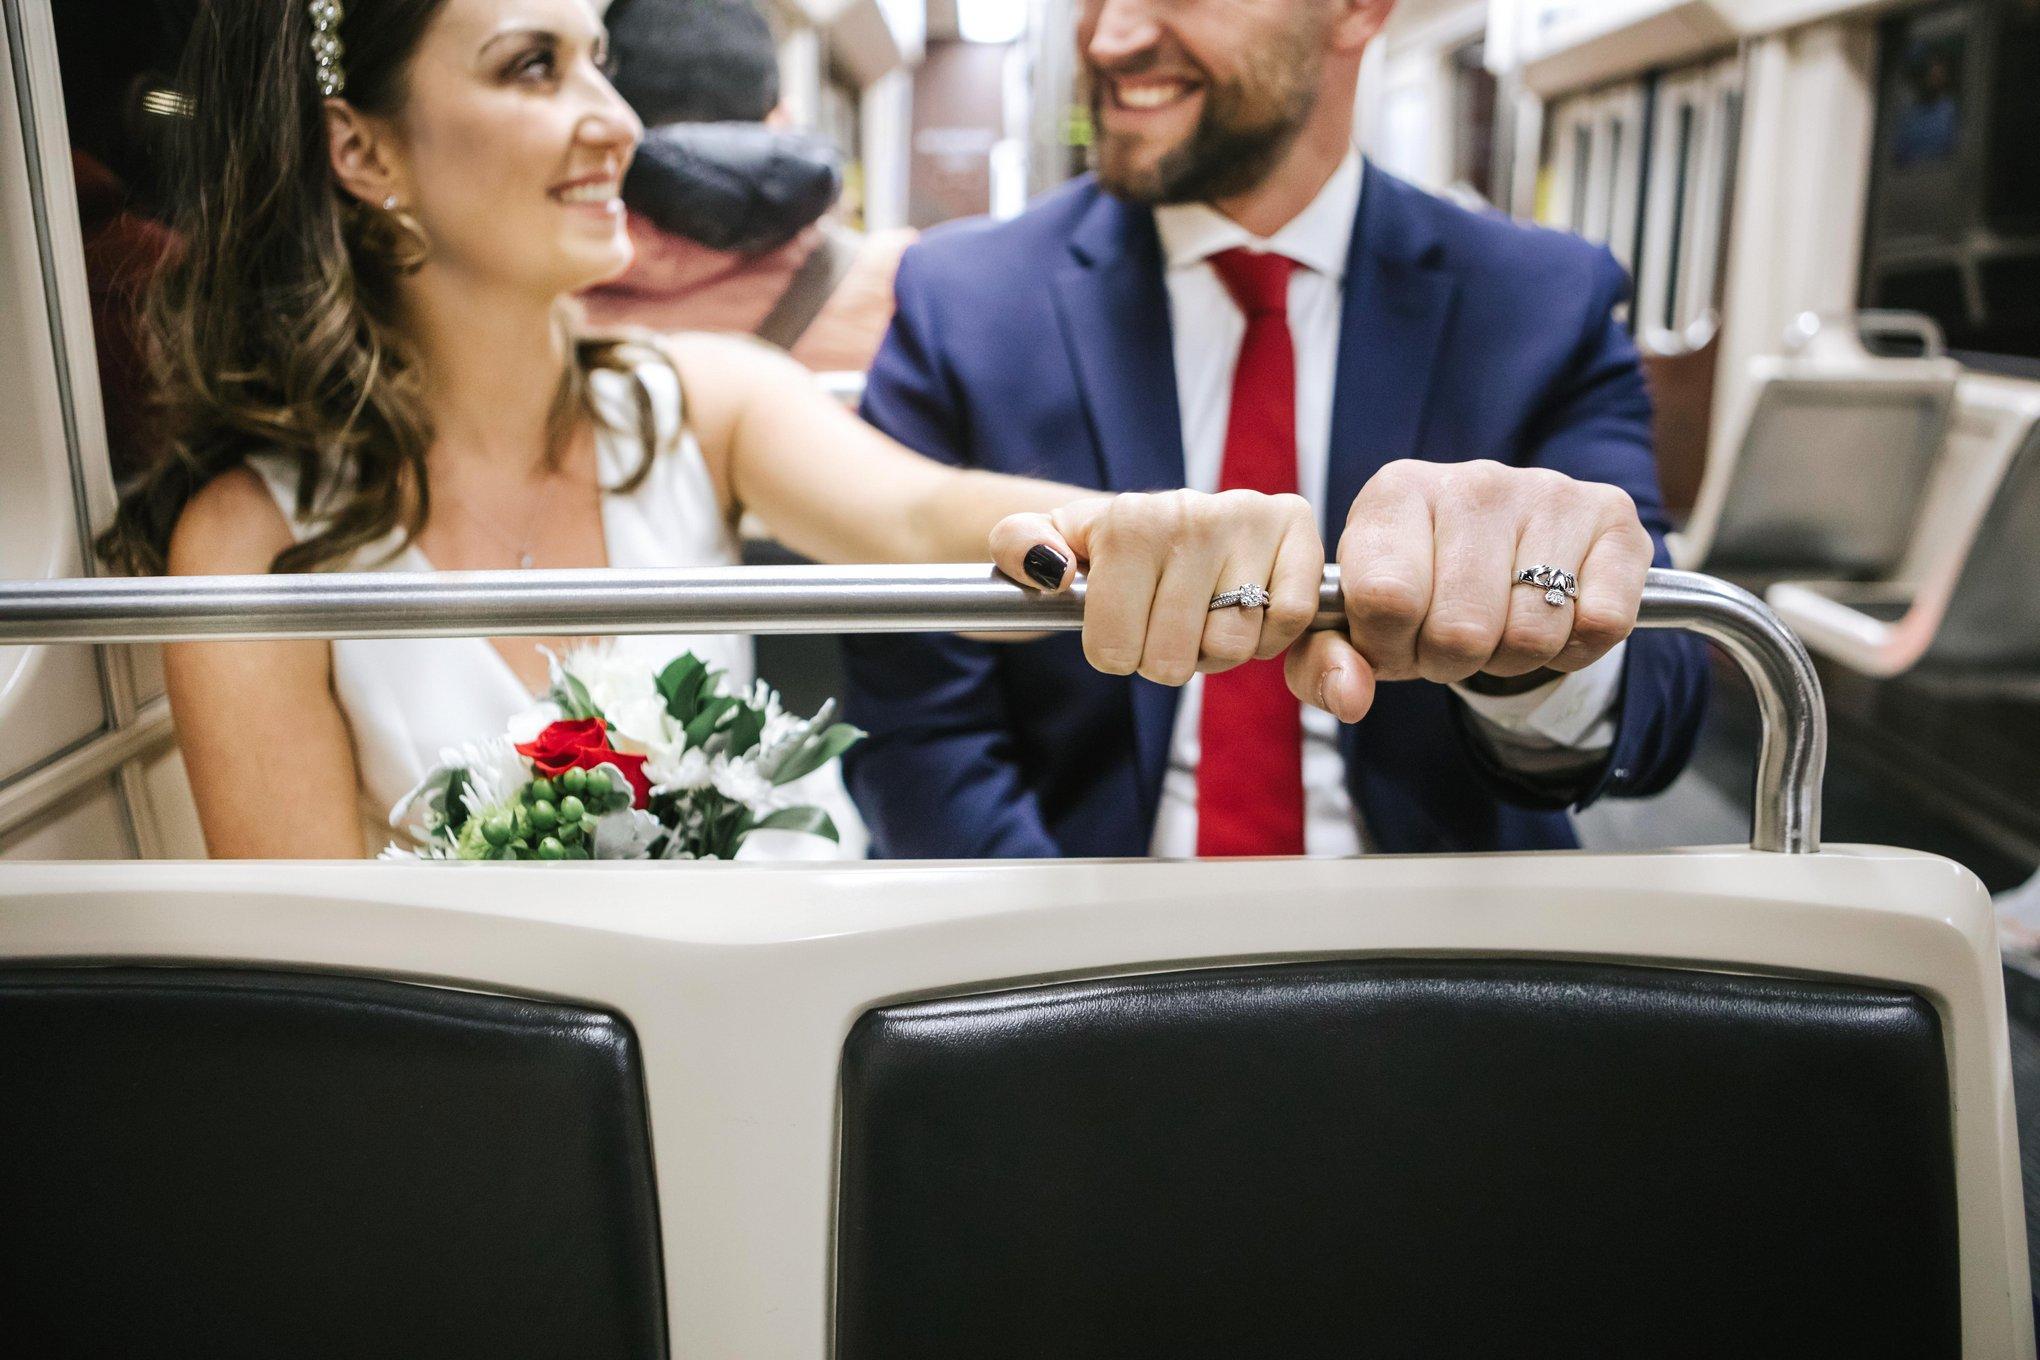 Boston-City-Hall-Wedding-Elopement-Photographer-Lena-Mirisola-11.JPG